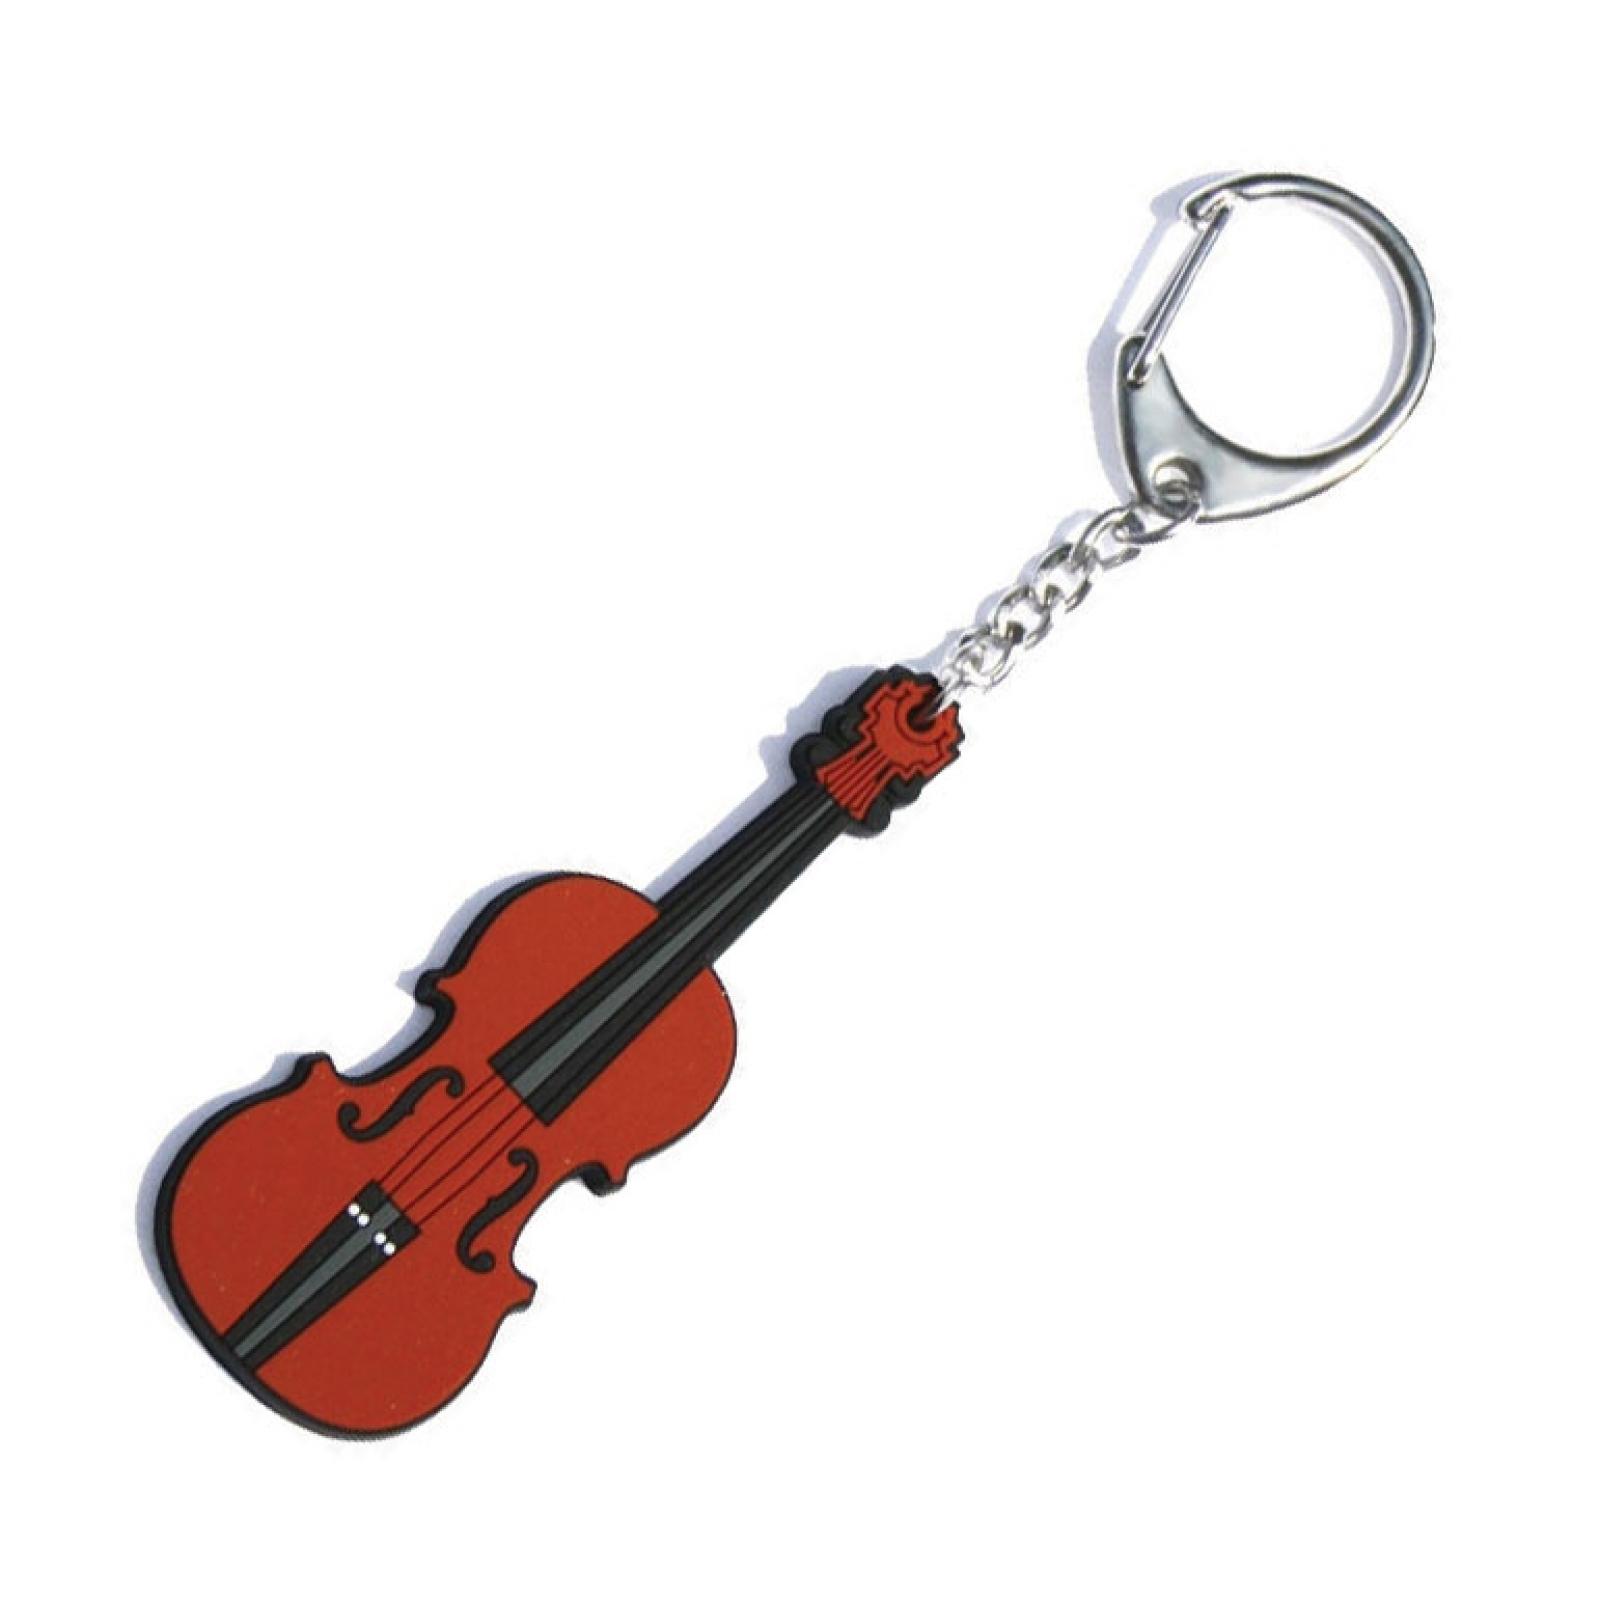 Hot House PVC Violin Keyring